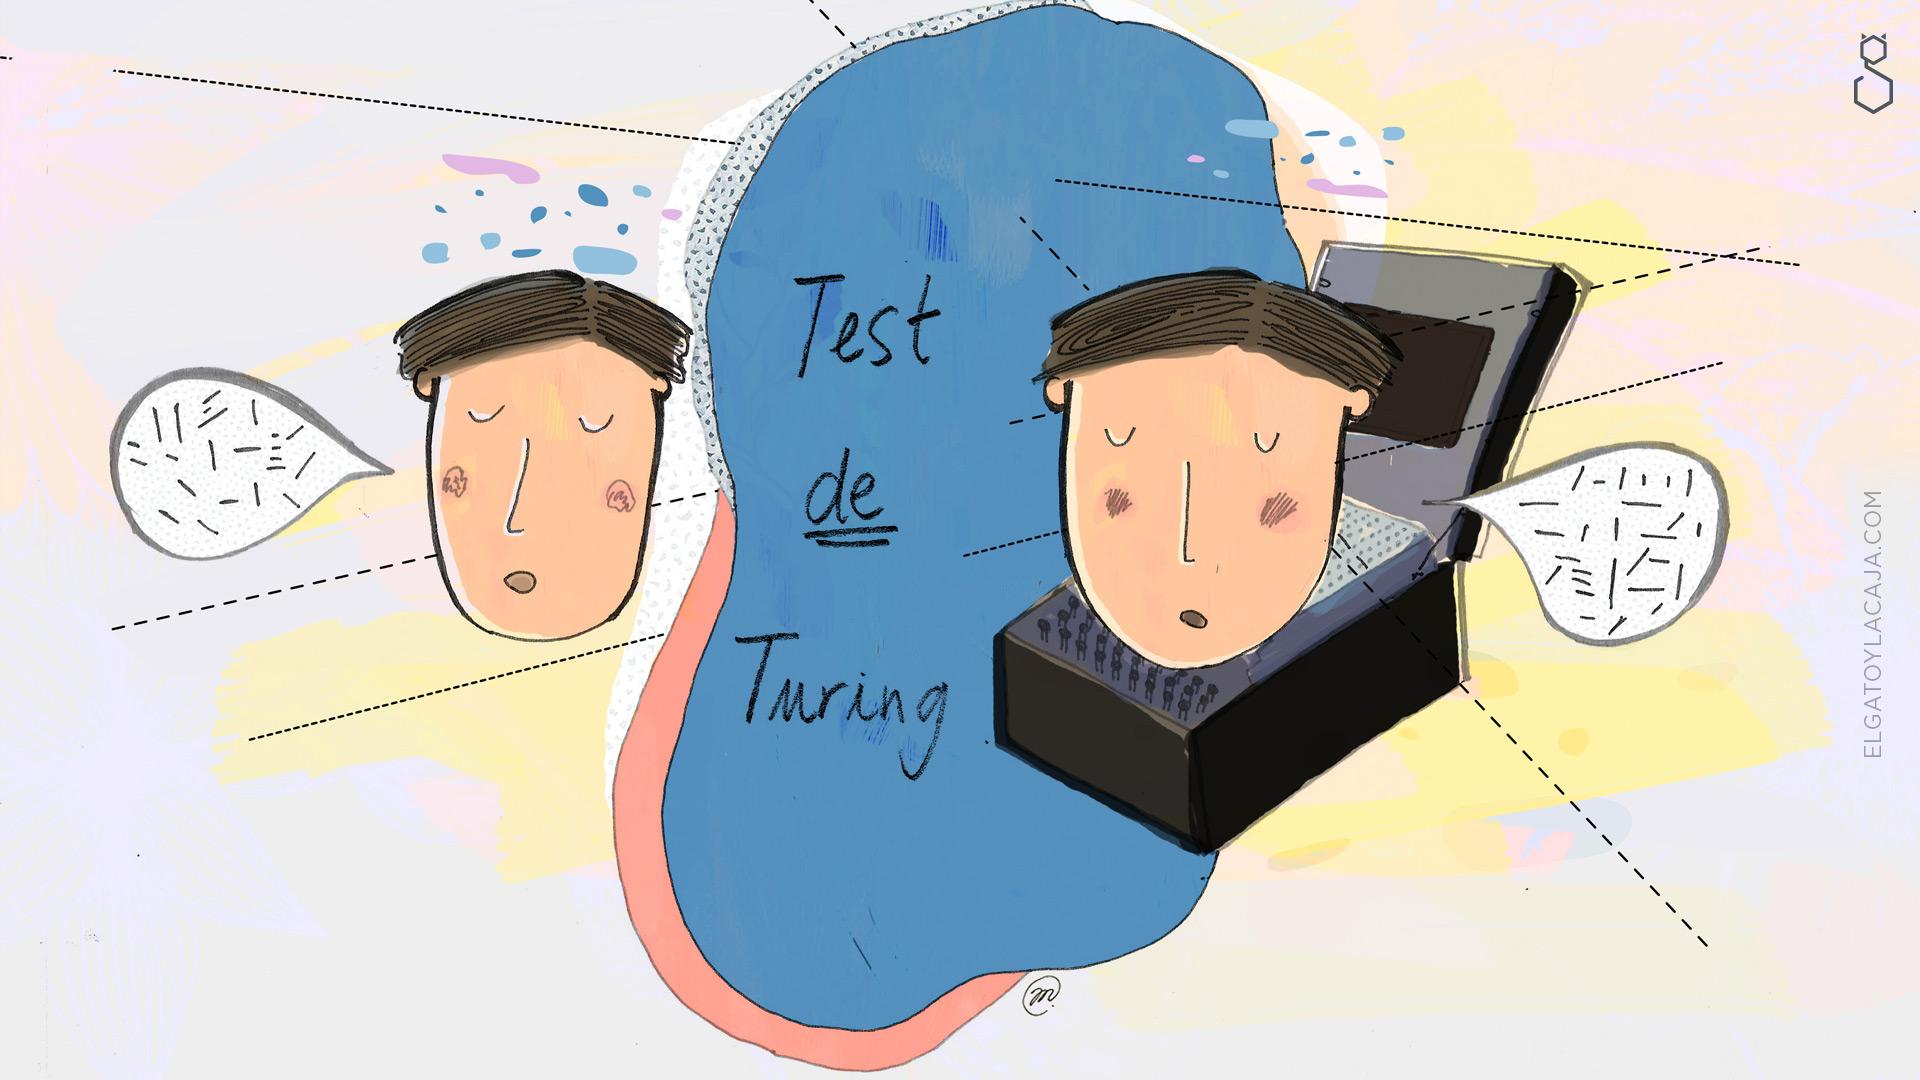 Turing al spiedo